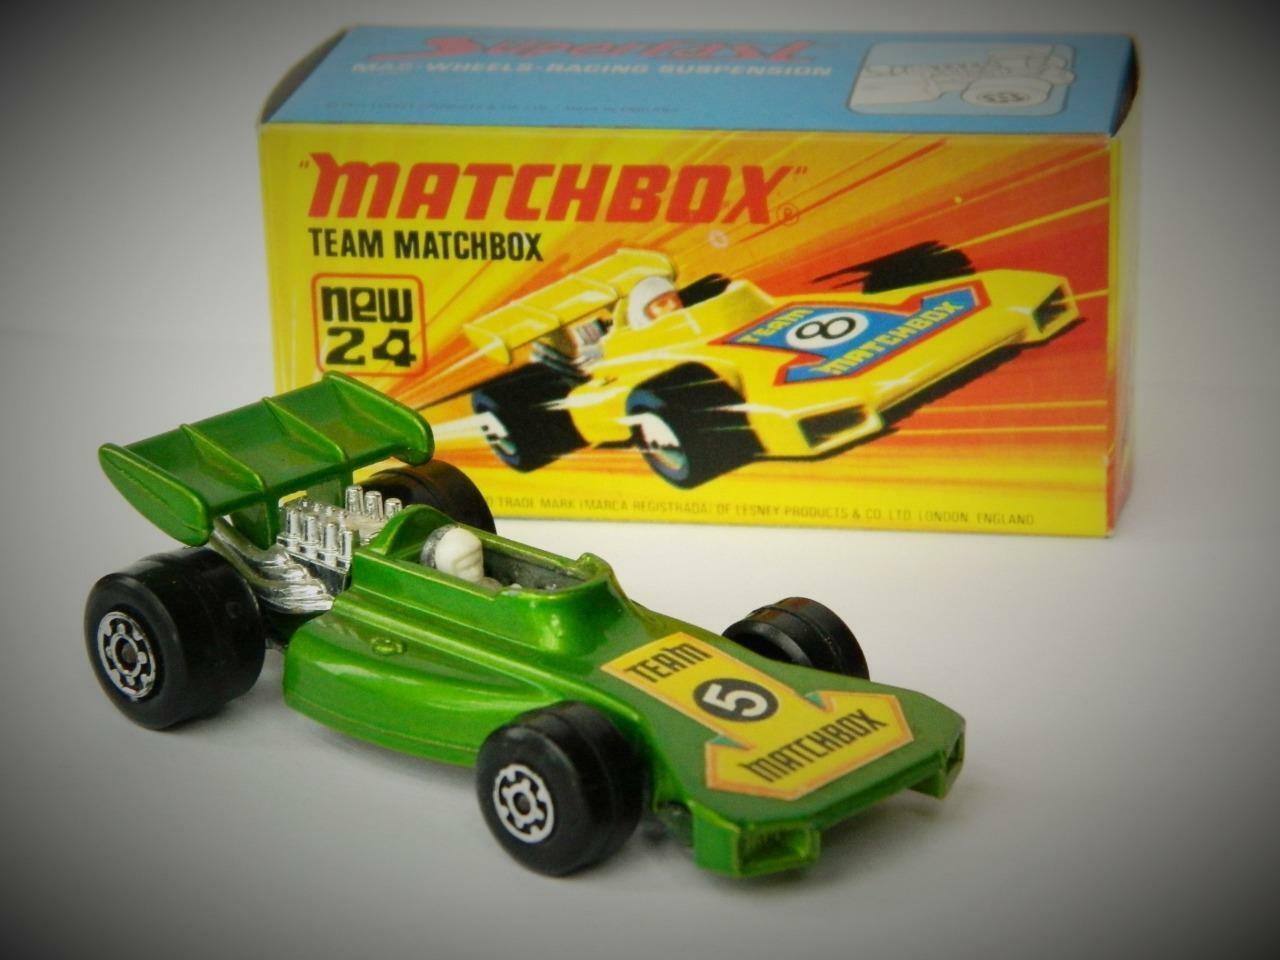 MATCHBOX SUPERFAST VINTAGE 1973 TEAM MATCHBOX RARE GREEN RACING CAR No.24 MIB